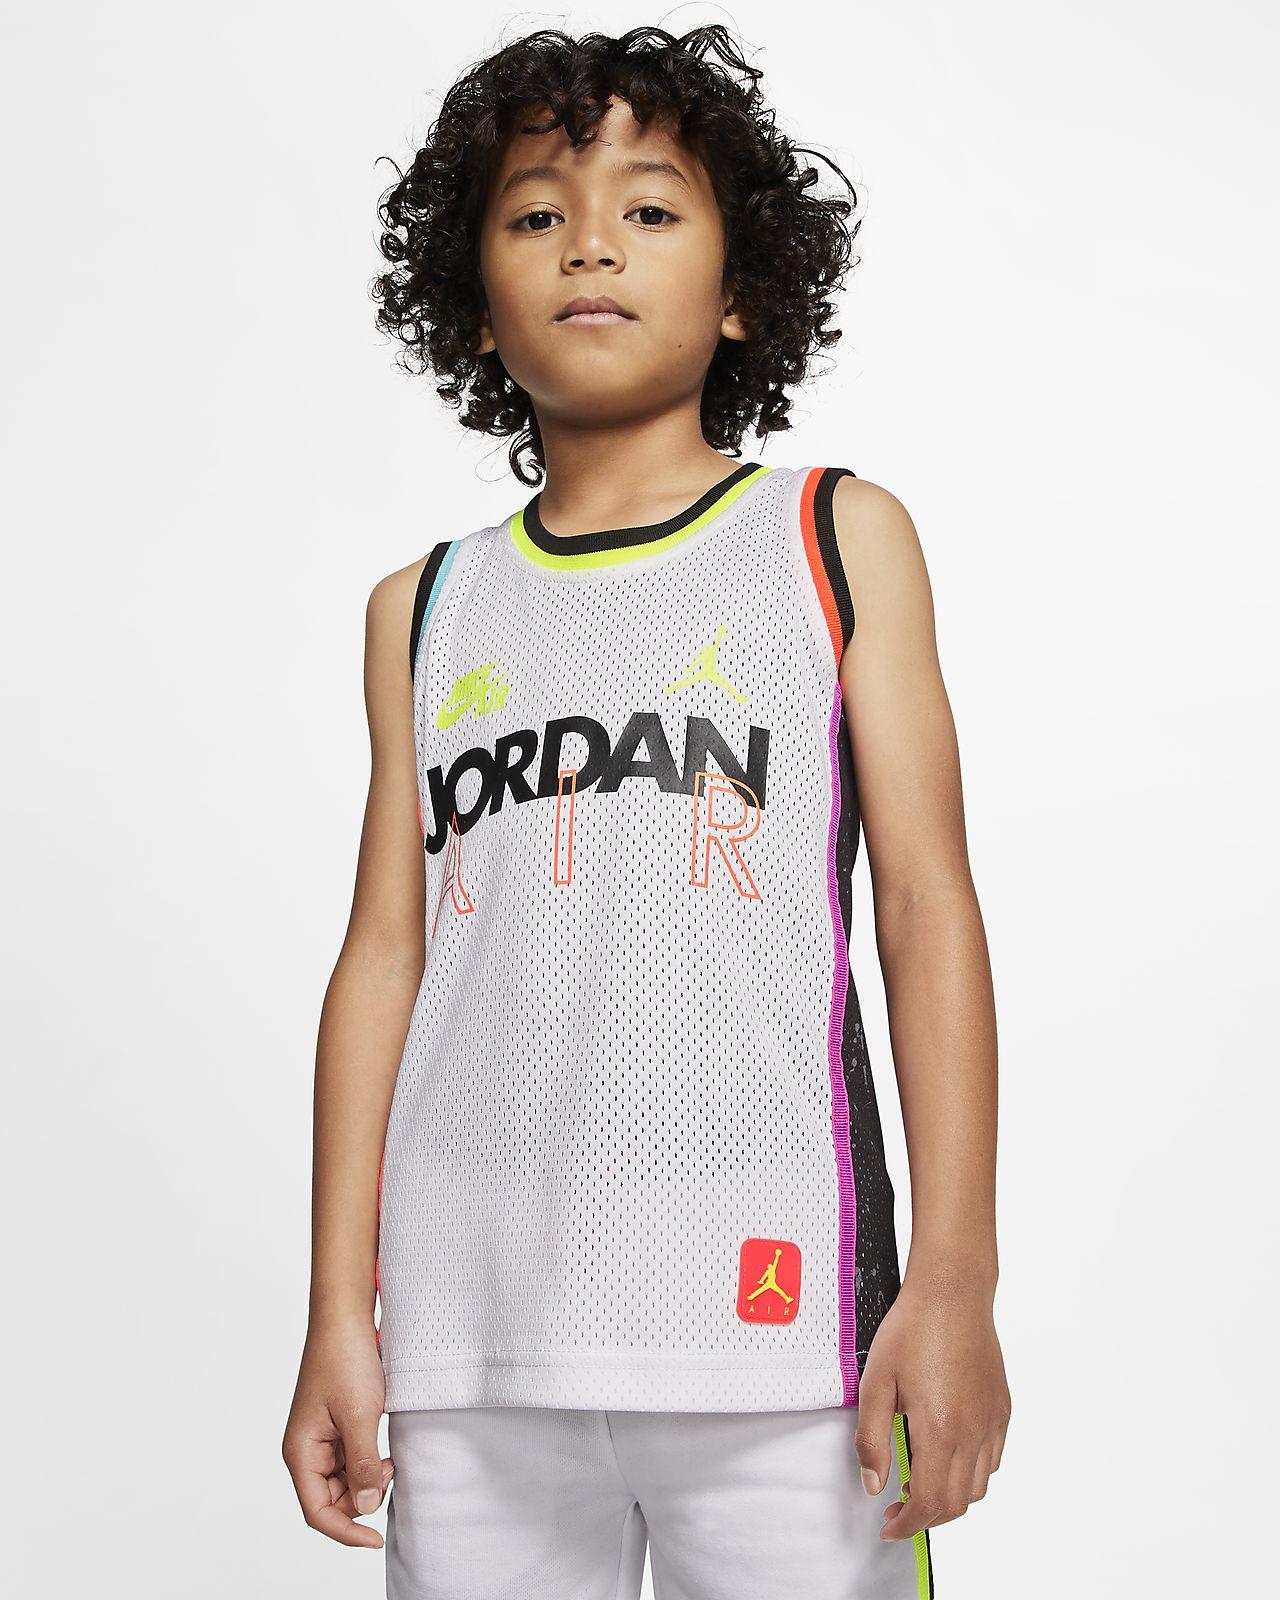 jd jordans kids \u003e Up to 73% OFF \u003e Free